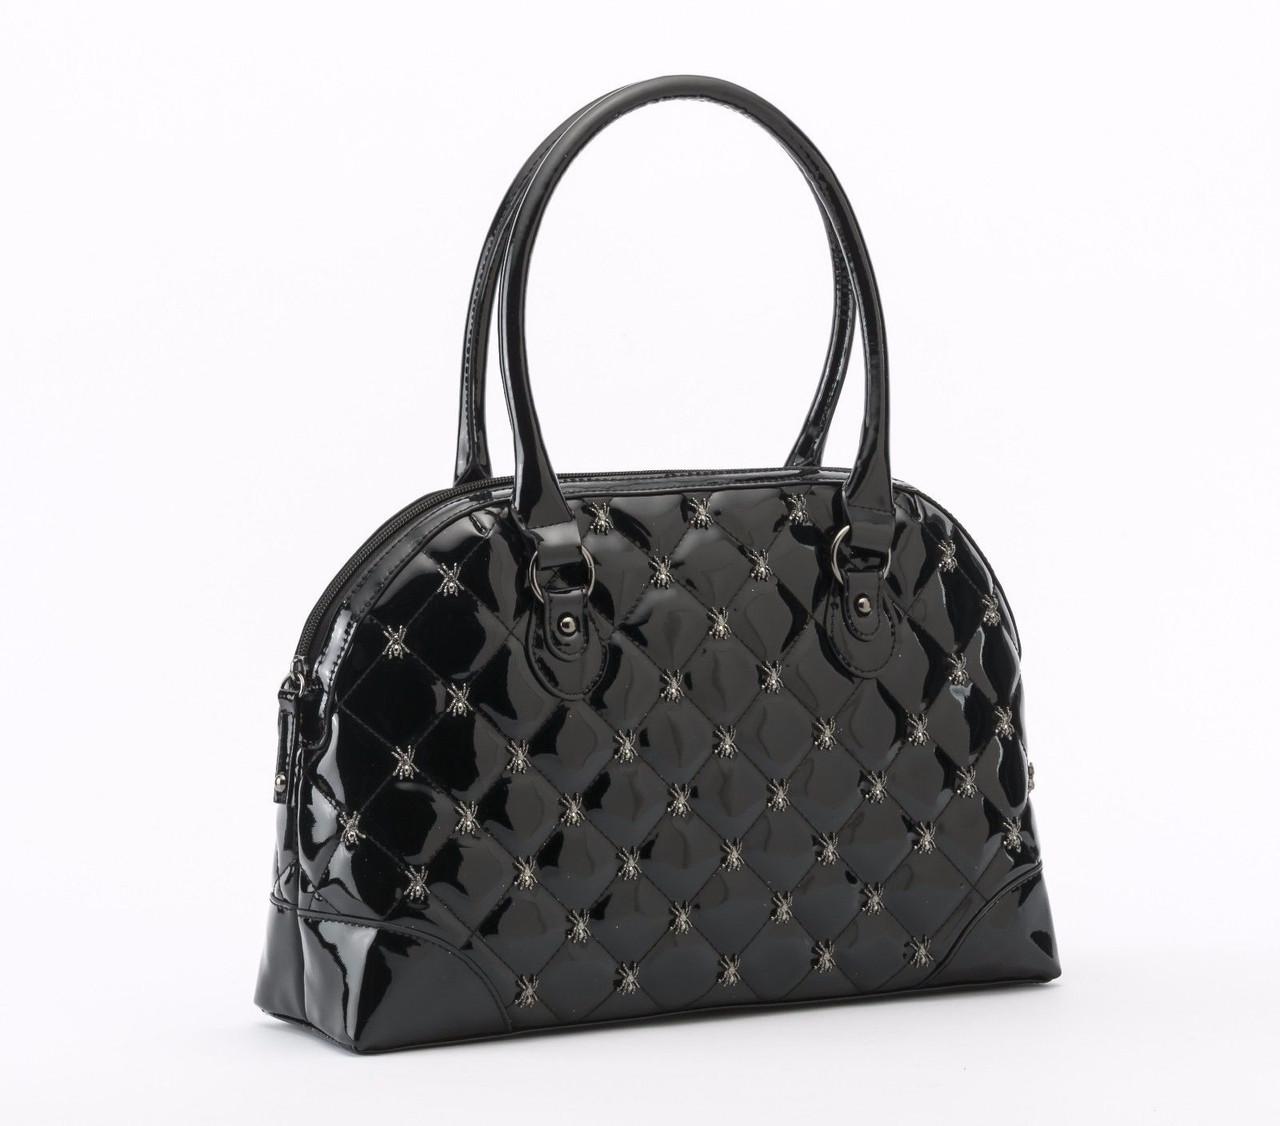 Rock Rebel GG Rose Lucy Quilted Handbag Spiders